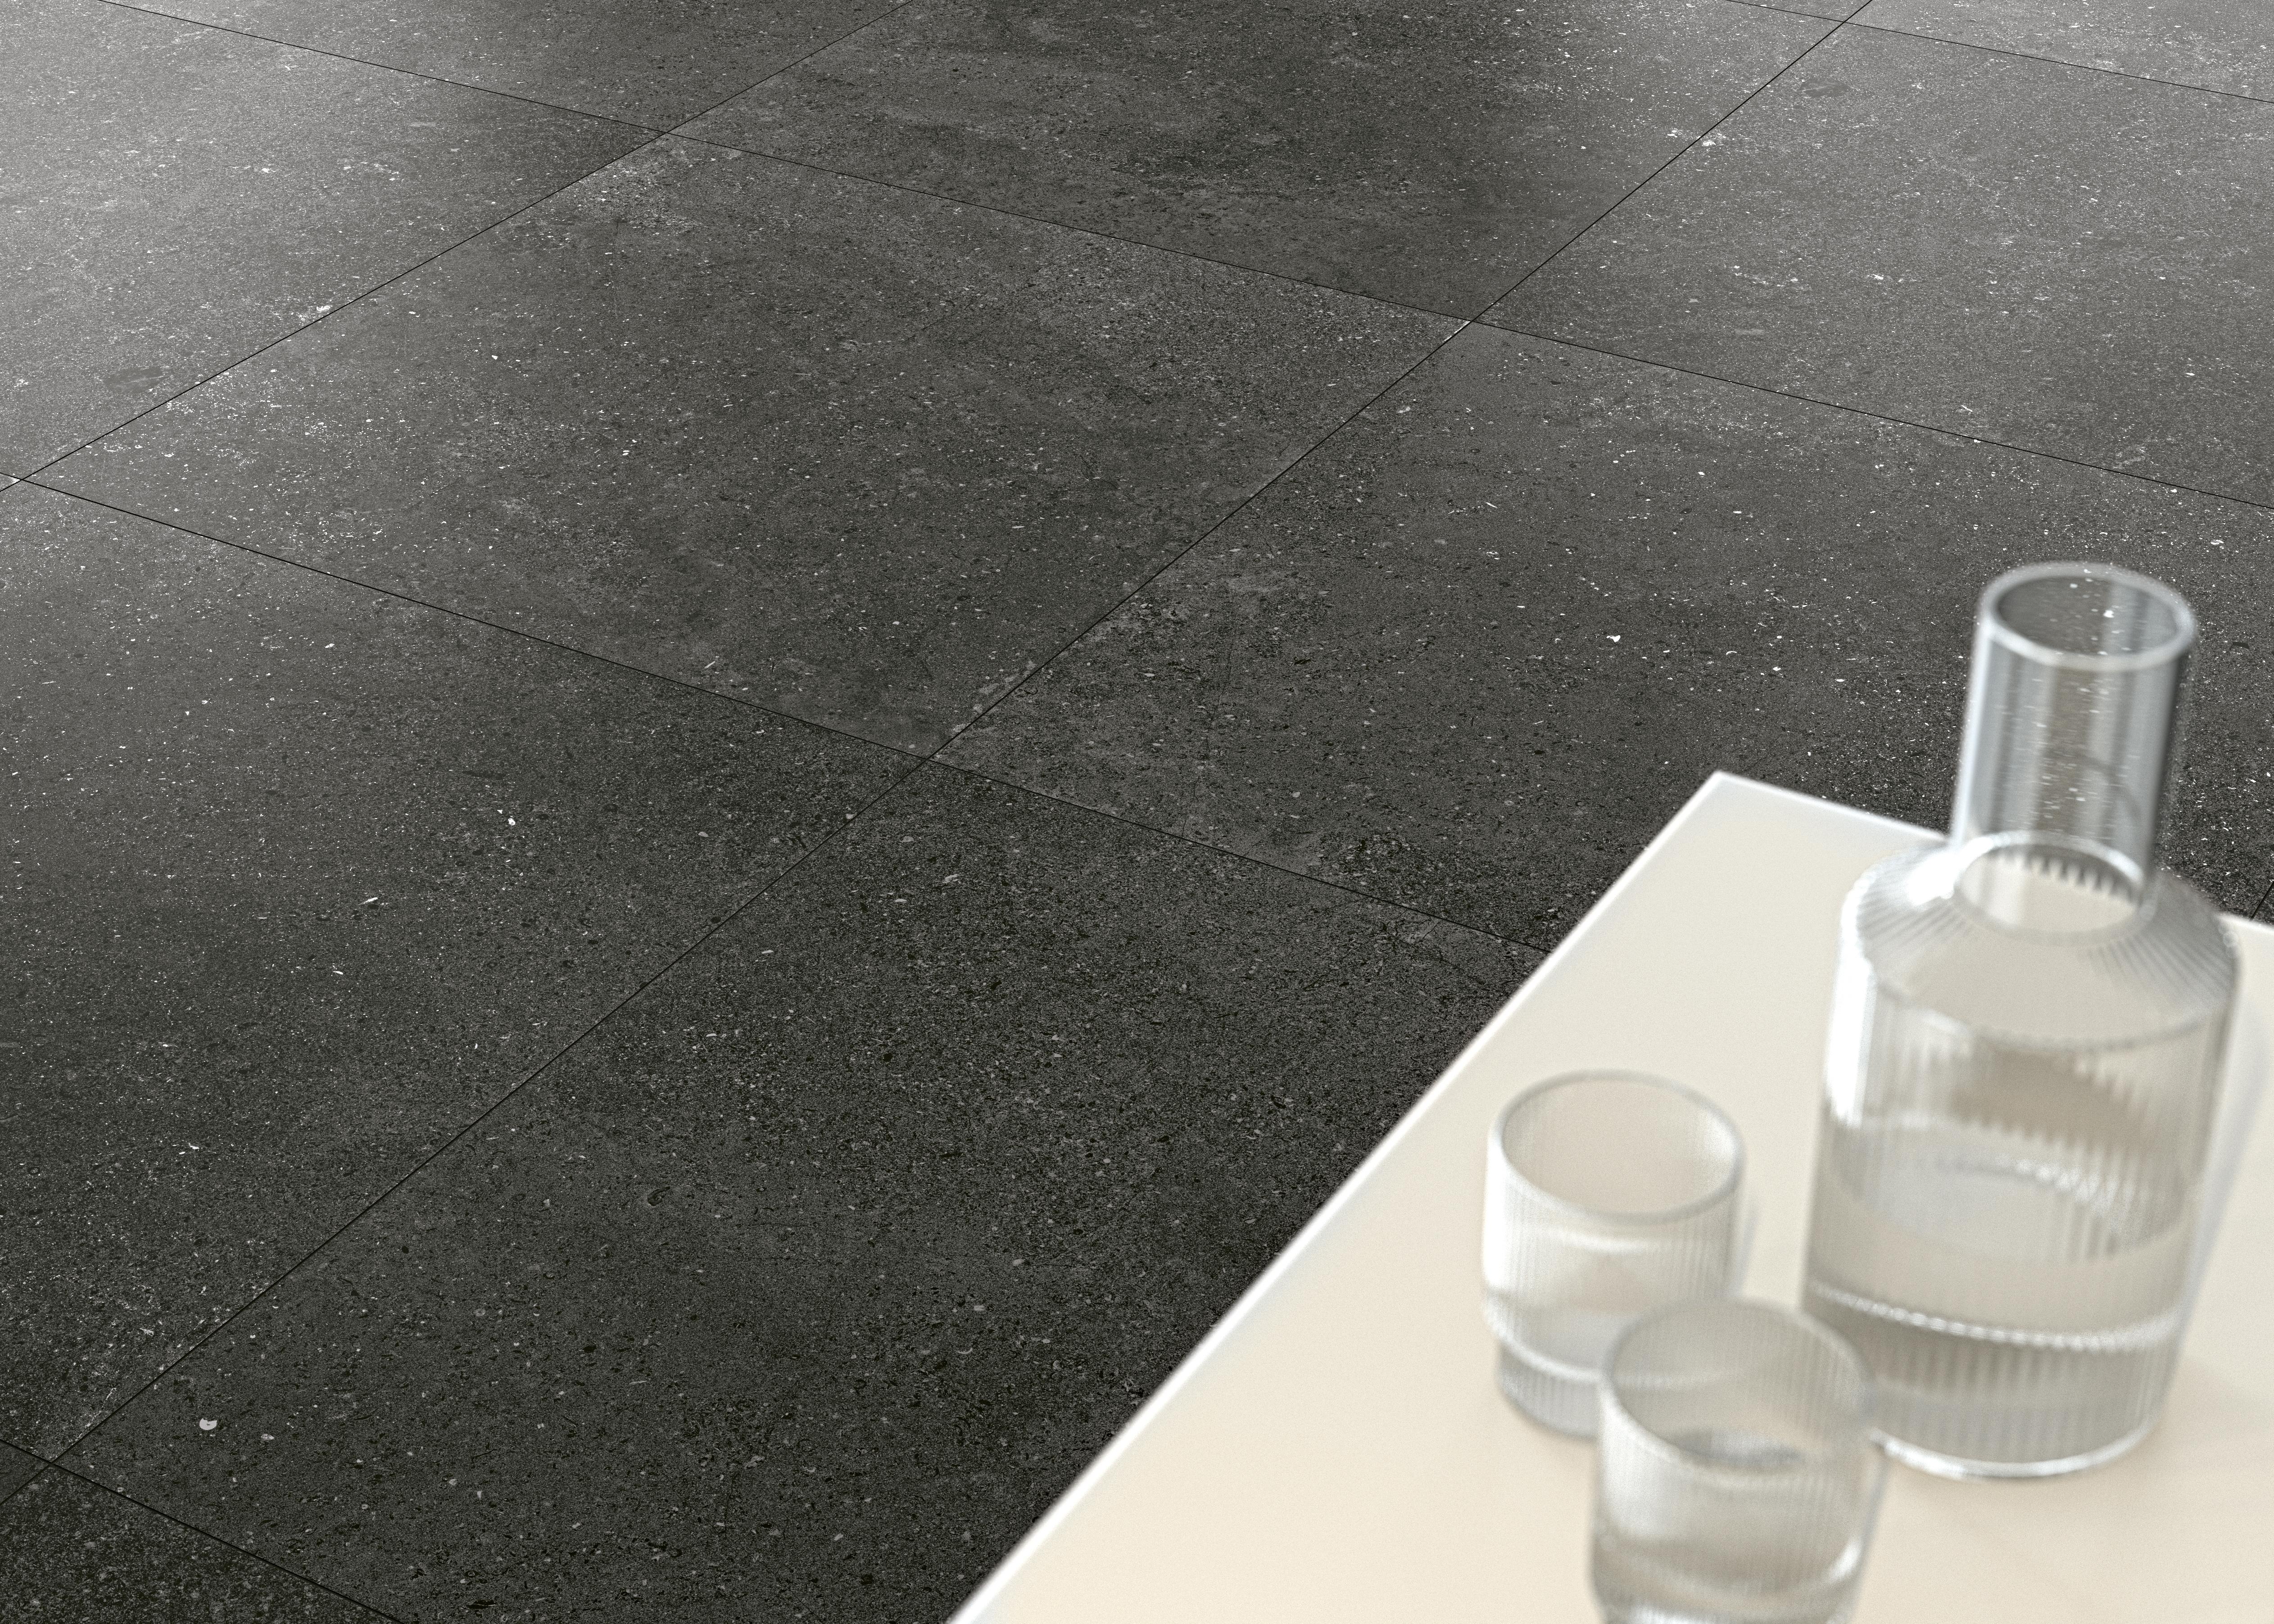 dunkel grau Steinoptik Bodenfliesen,  dark grey  stone effect tiles tiles  on the floor